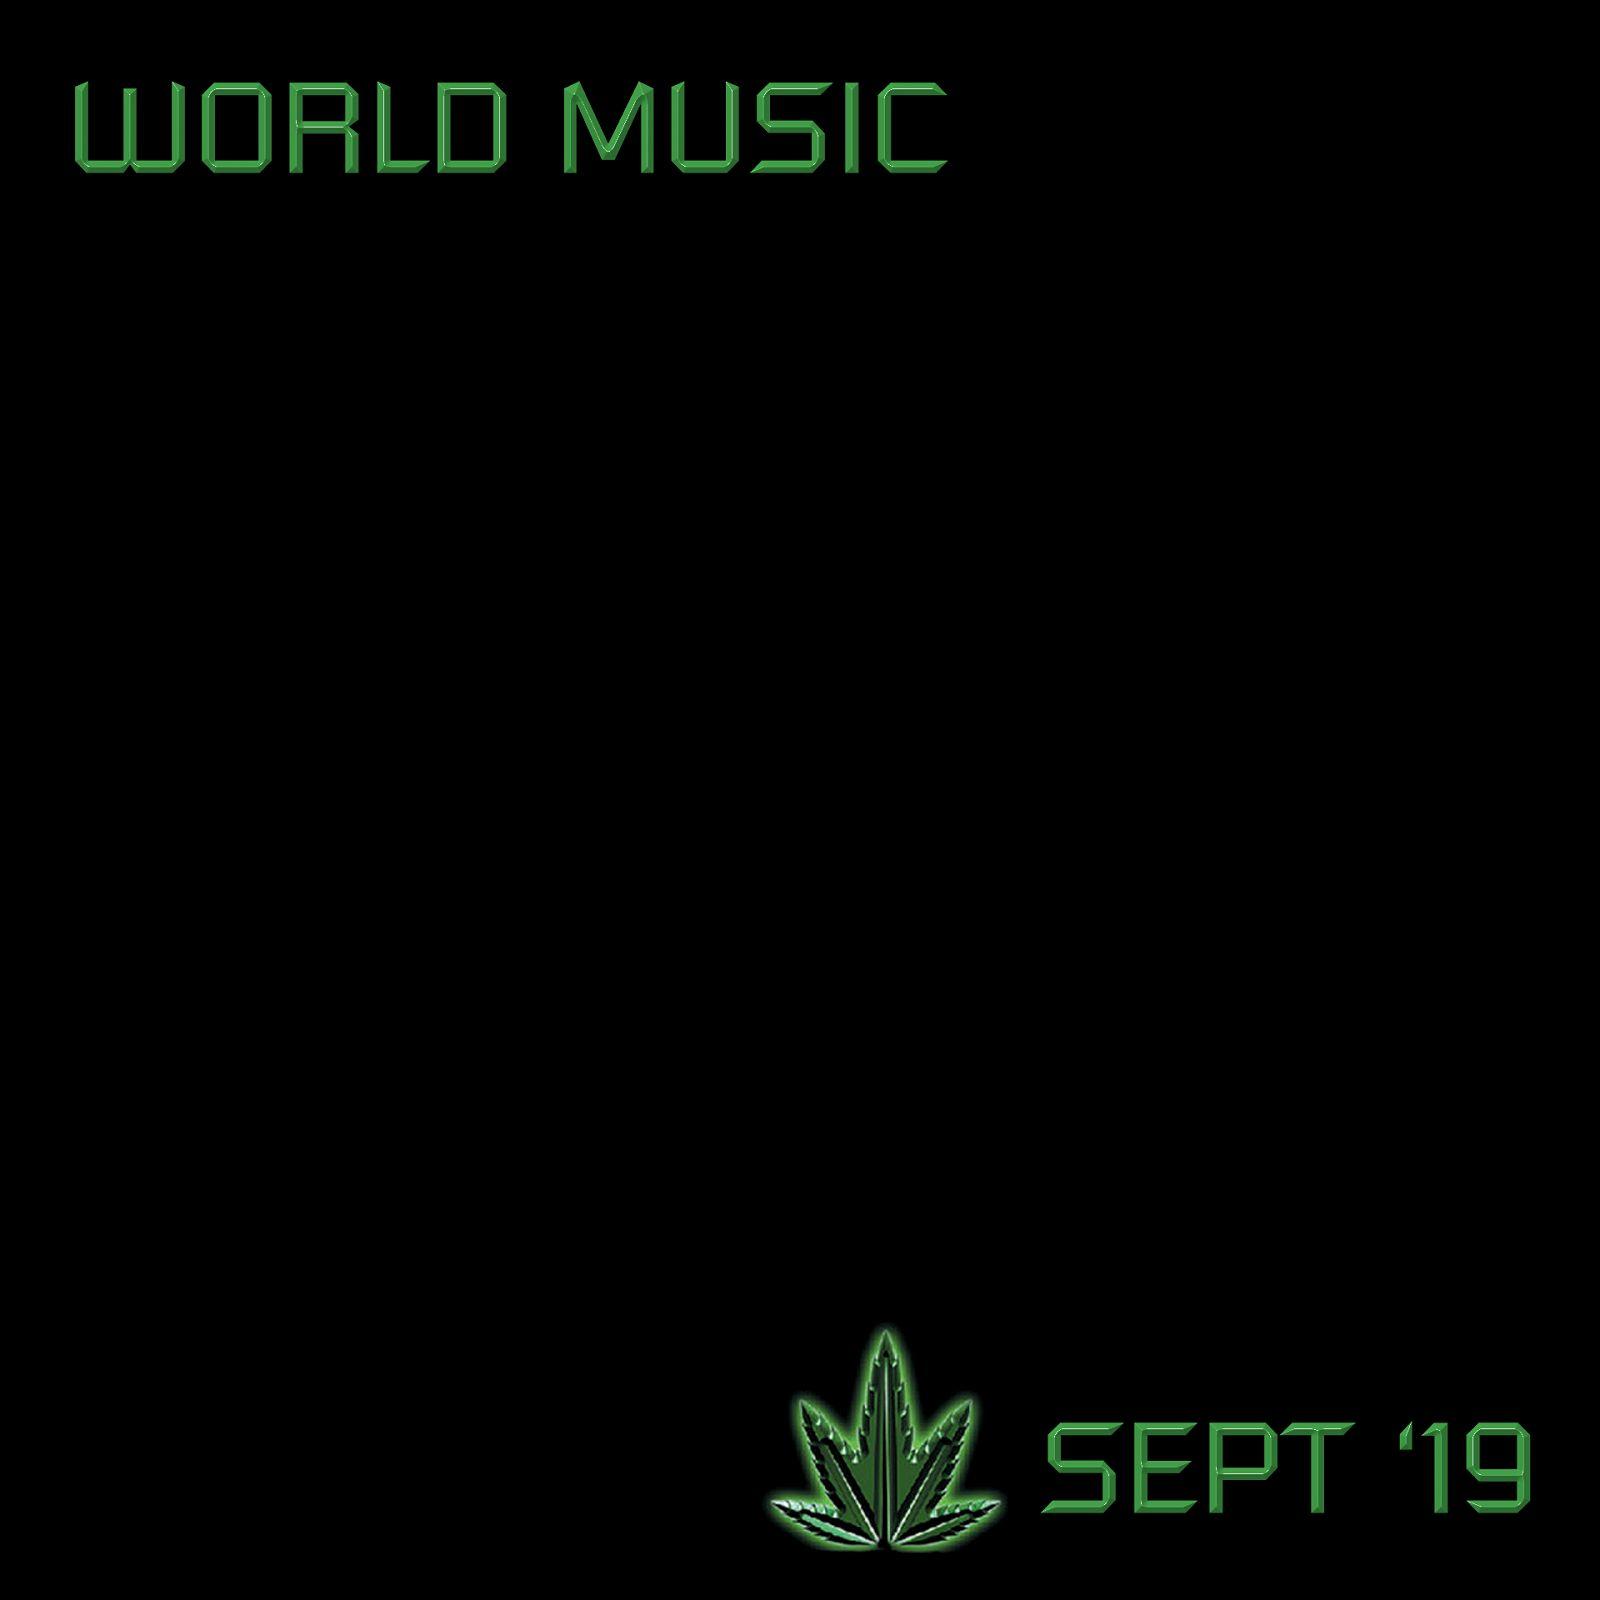 WORLD MUSIC 2.jpg